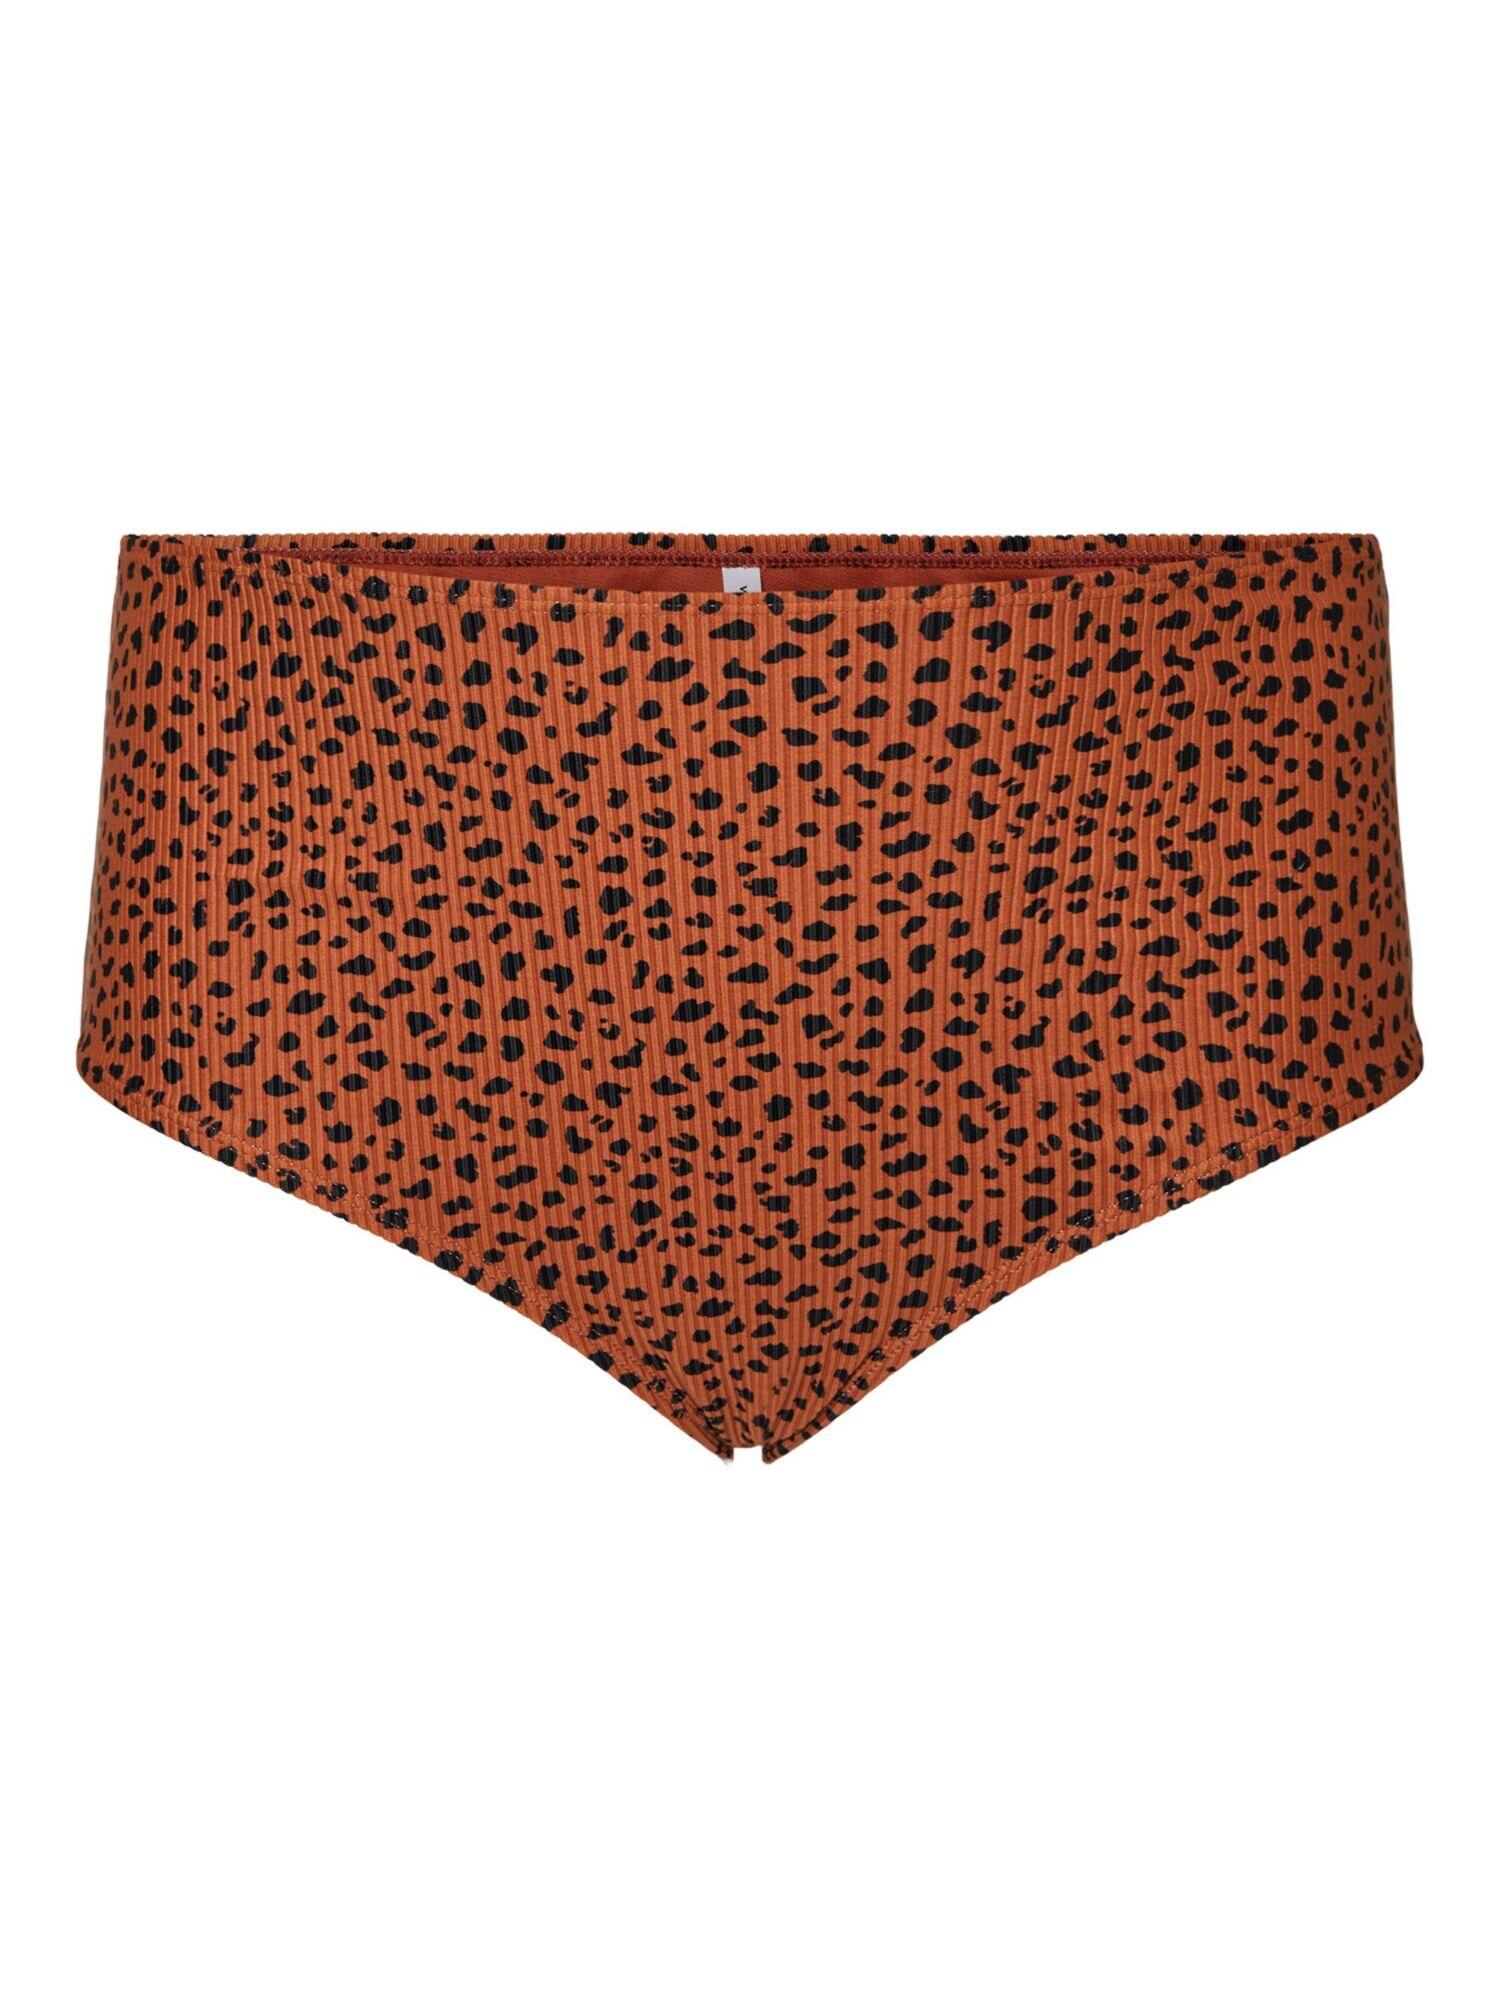 Vero Moda Curve Bas de bikini 'Madison'  - Marron - Taille: 6XL - female